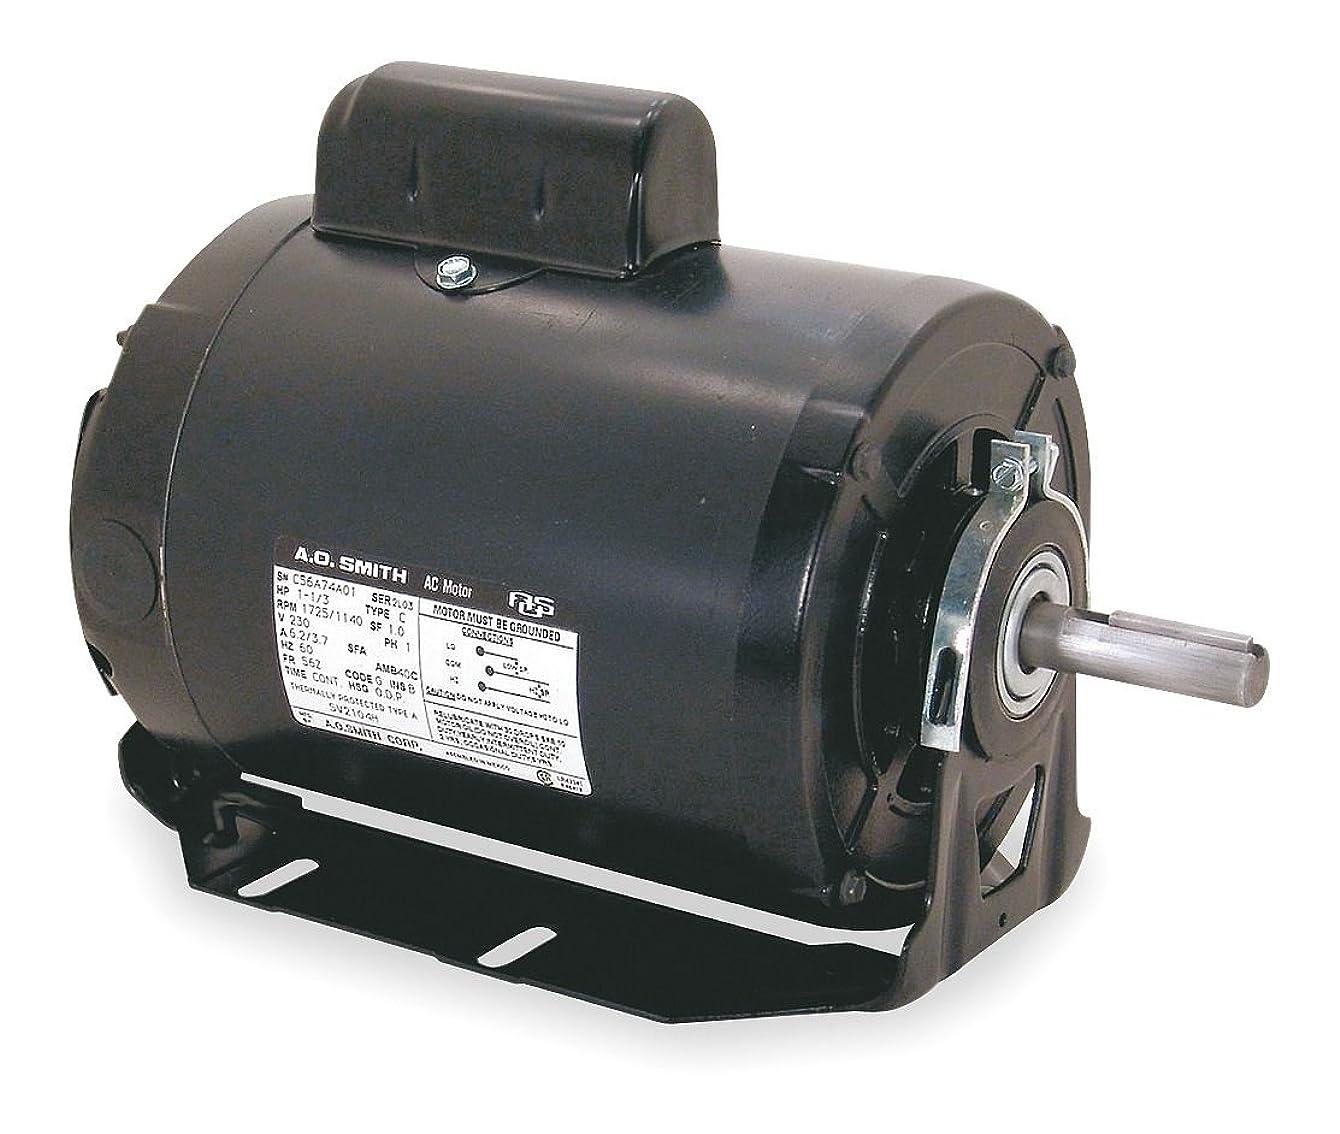 Century SV2104HV2 2 hp 1725/1140 rpm 230V Evaporative Cooler Motor